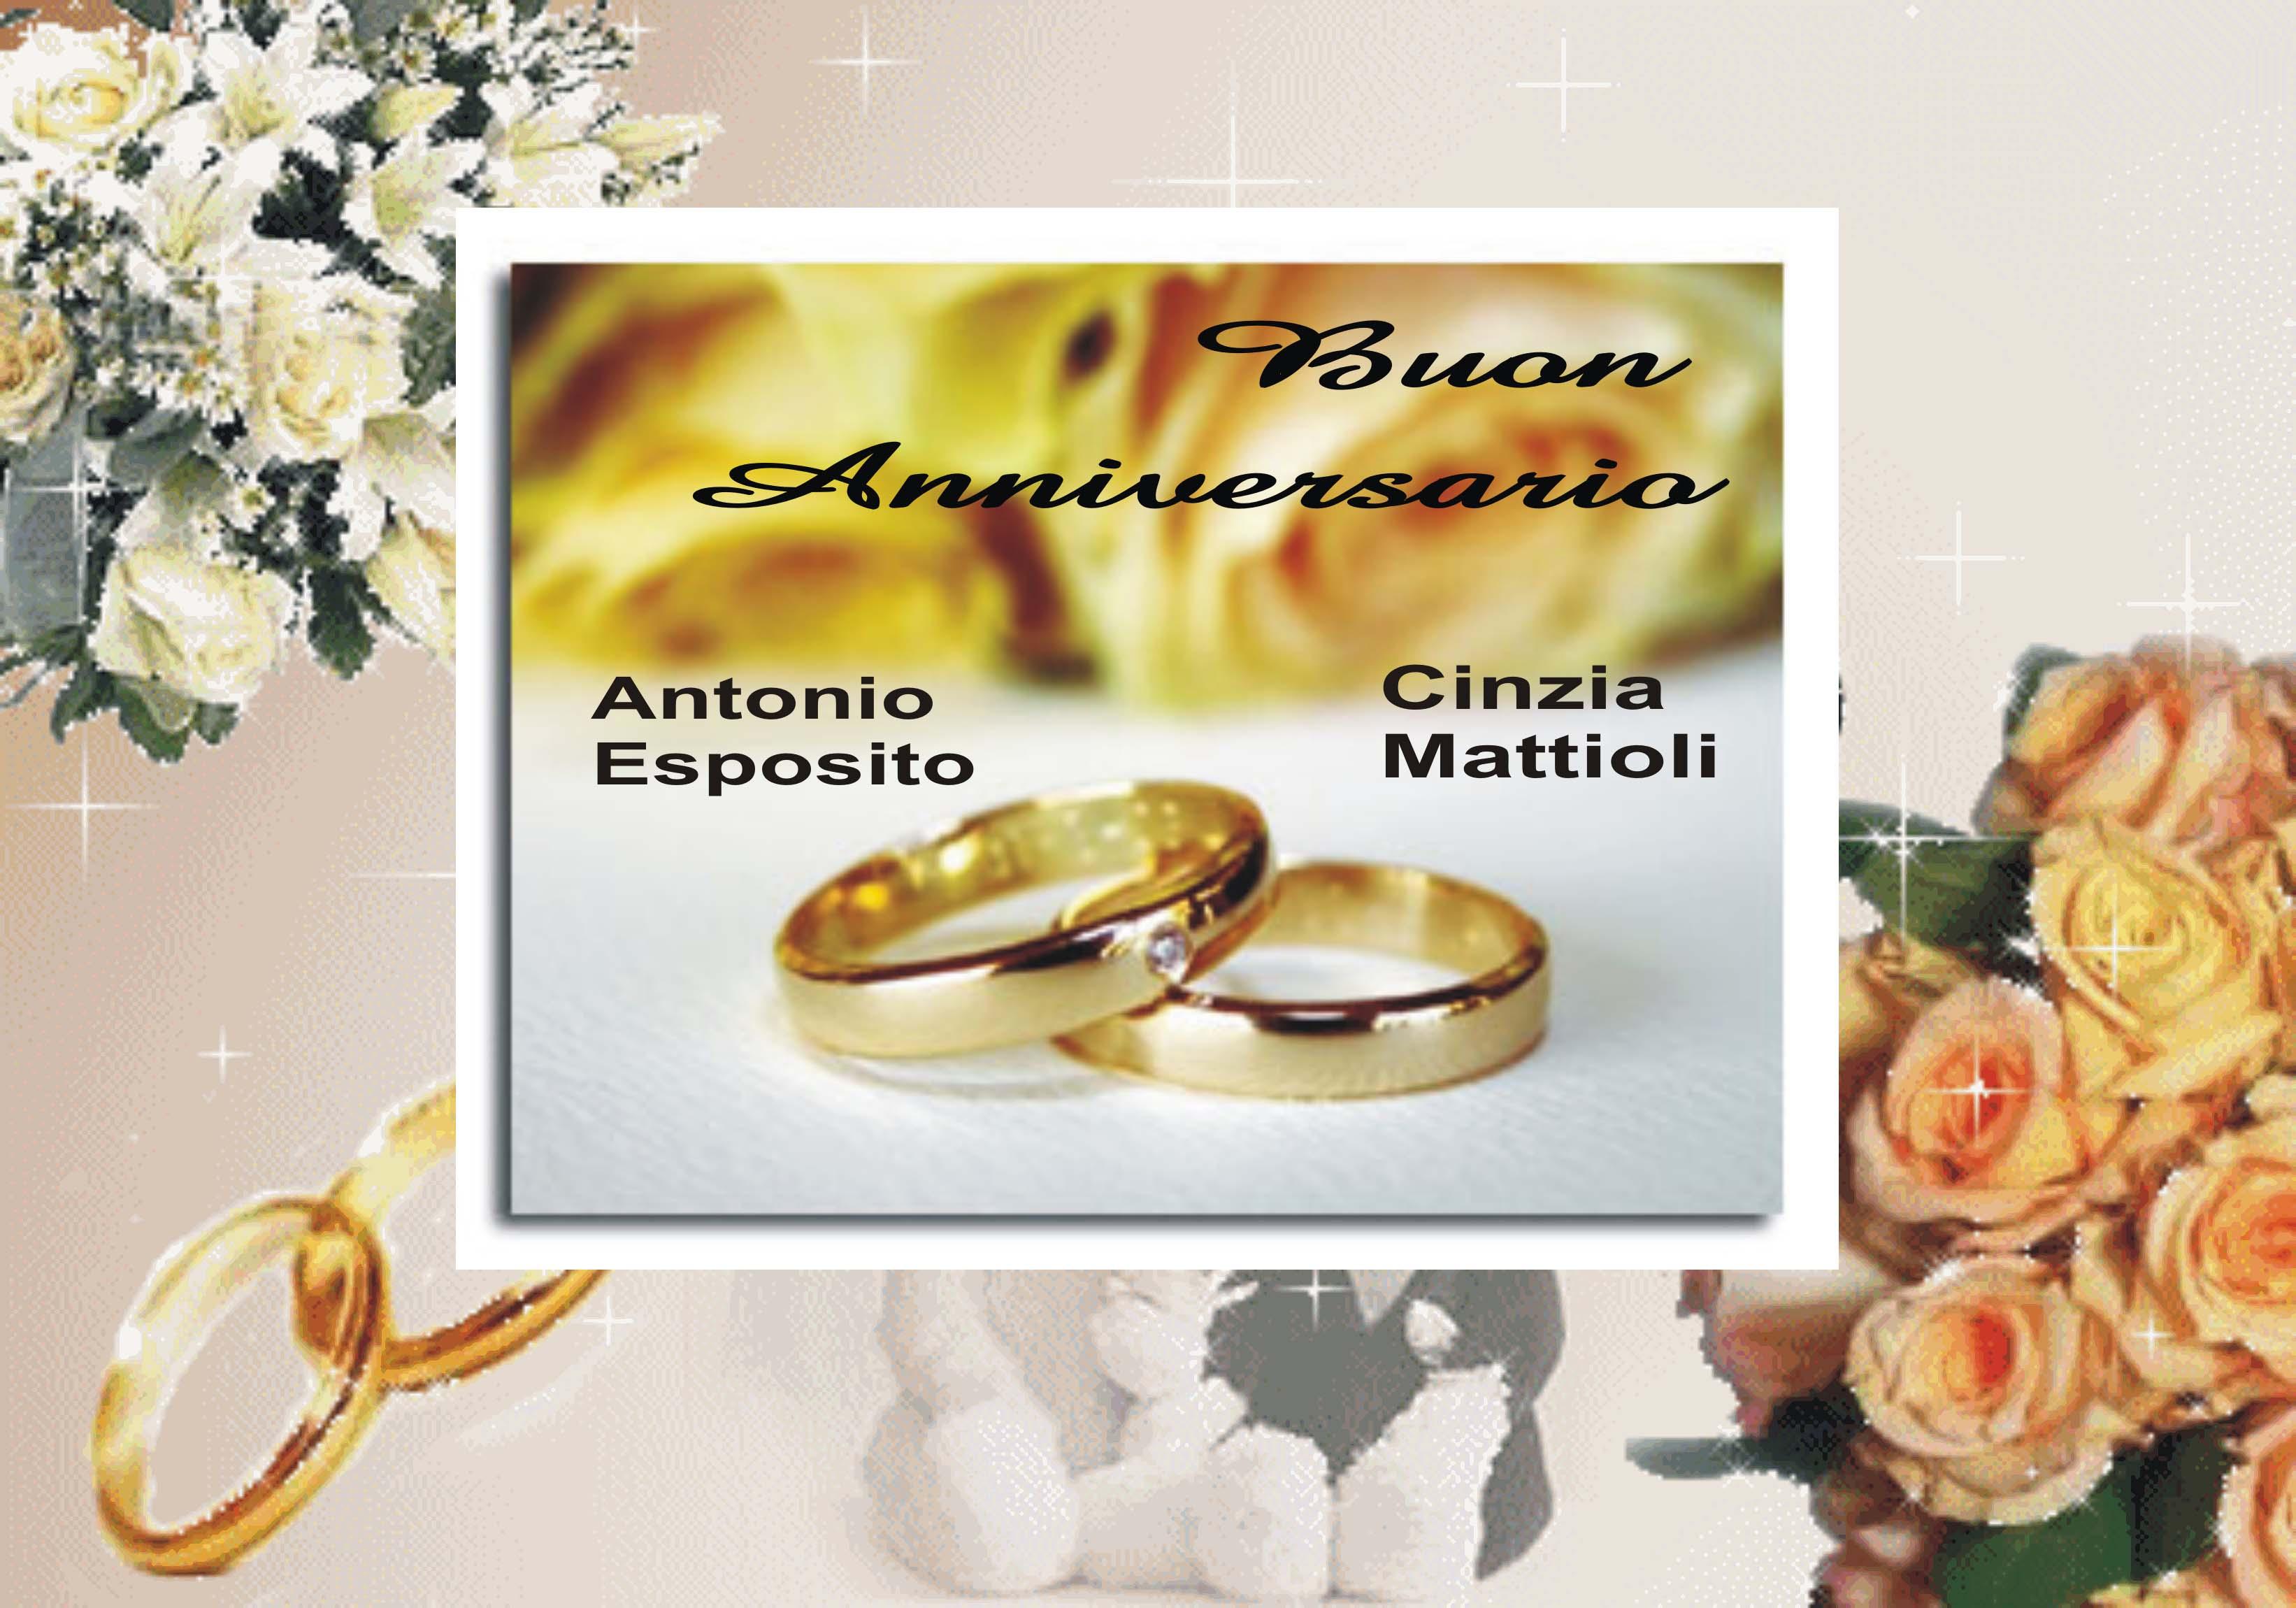 Matrimonio Auguri Anniversario : Super anni di matrimonio op pineglen